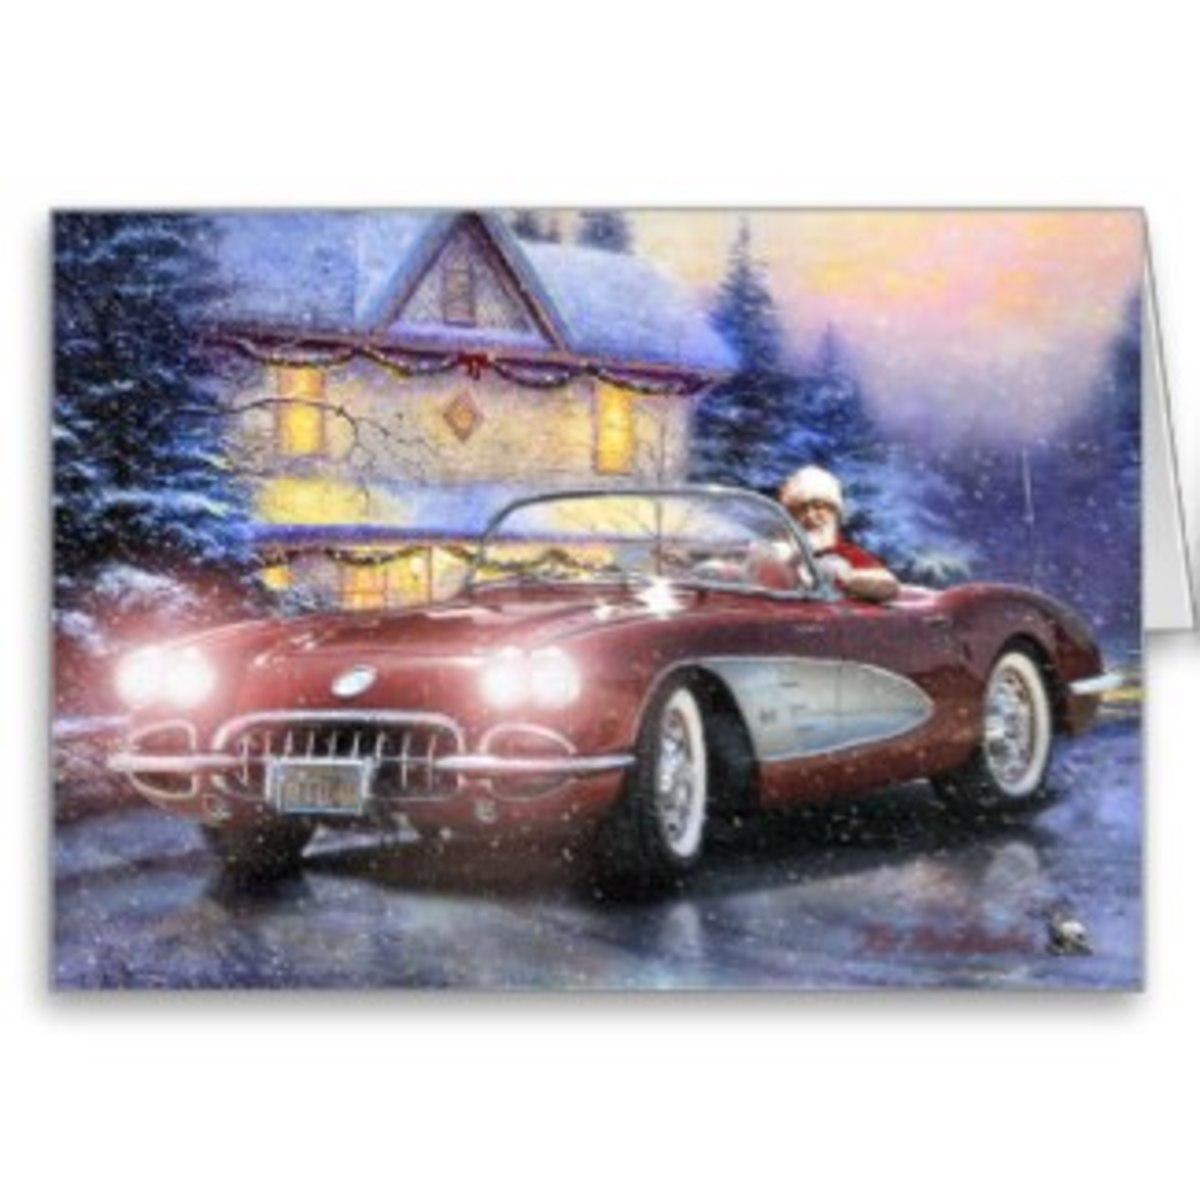 I wish Santa were bringing this Corvette to my house.